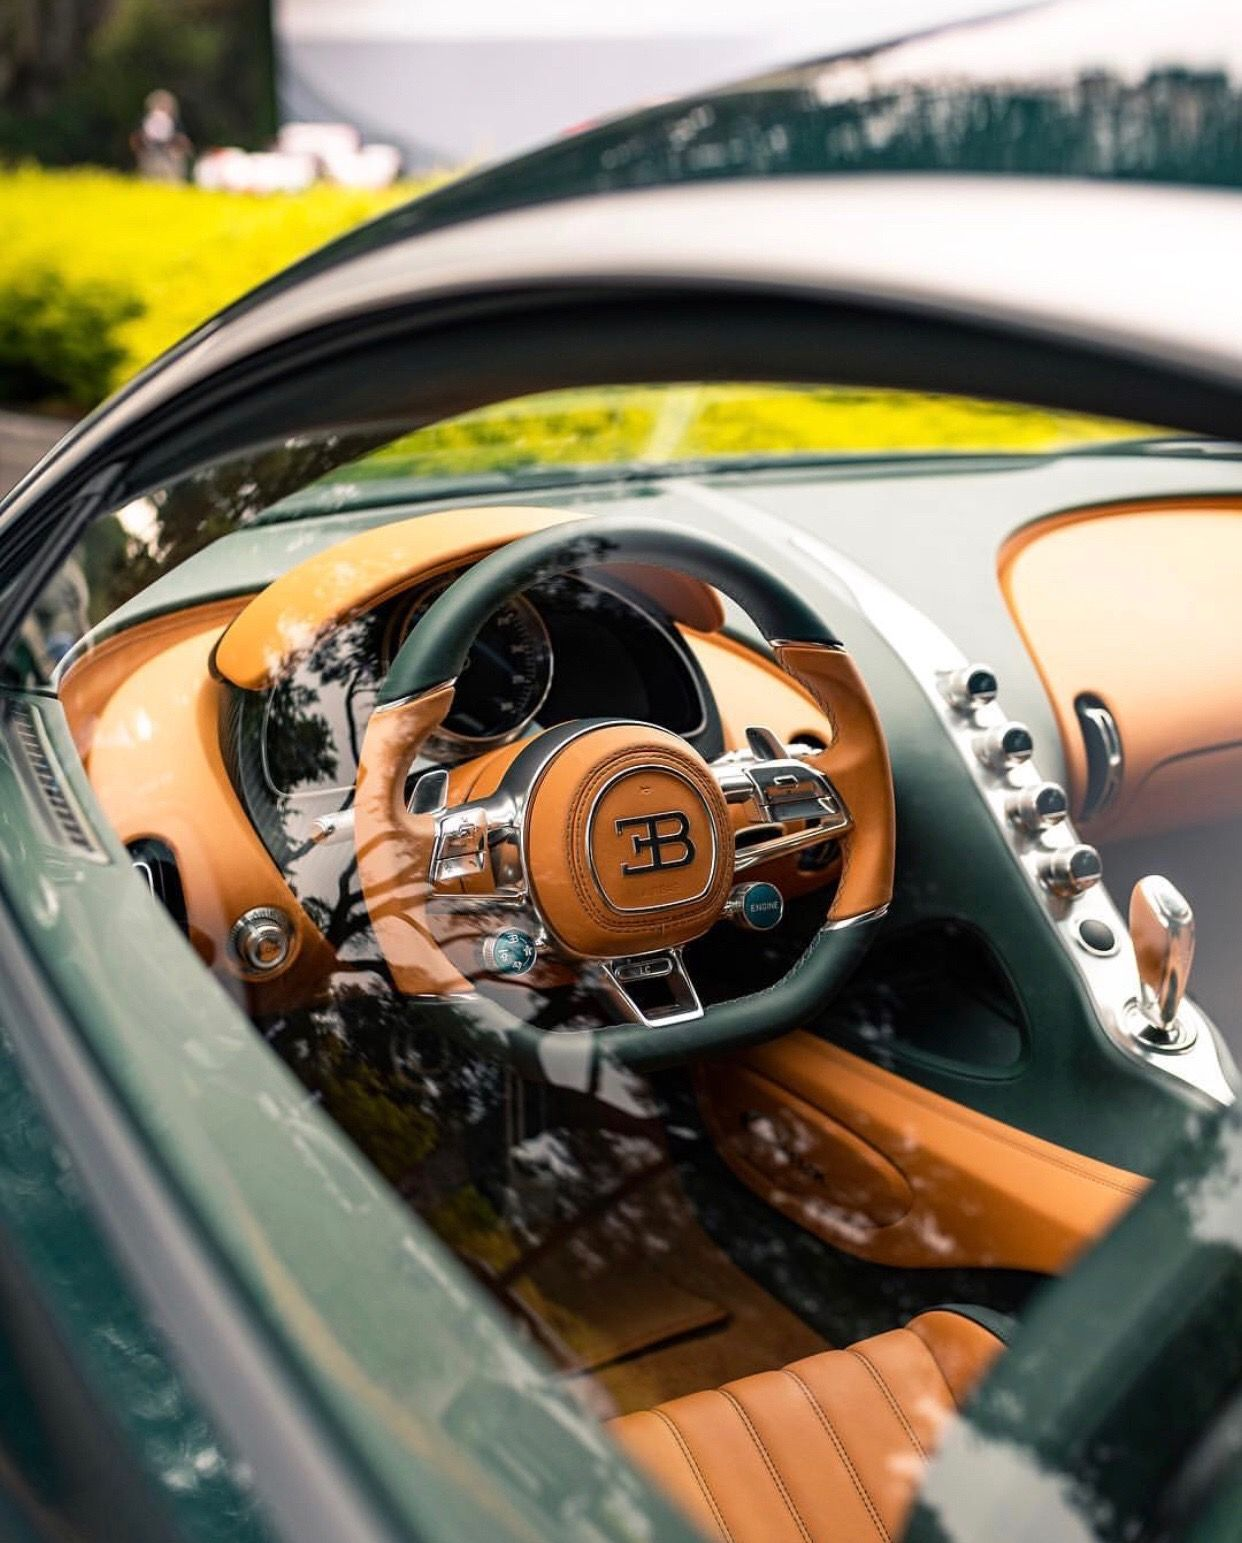 Interior Of The Bugatti Chiron In Fully Exposed Green Carbon Fiber Photo Taken By Alexbabington On Instagram Bugatti Chiron Interior Bugatti Chiron Bugatti